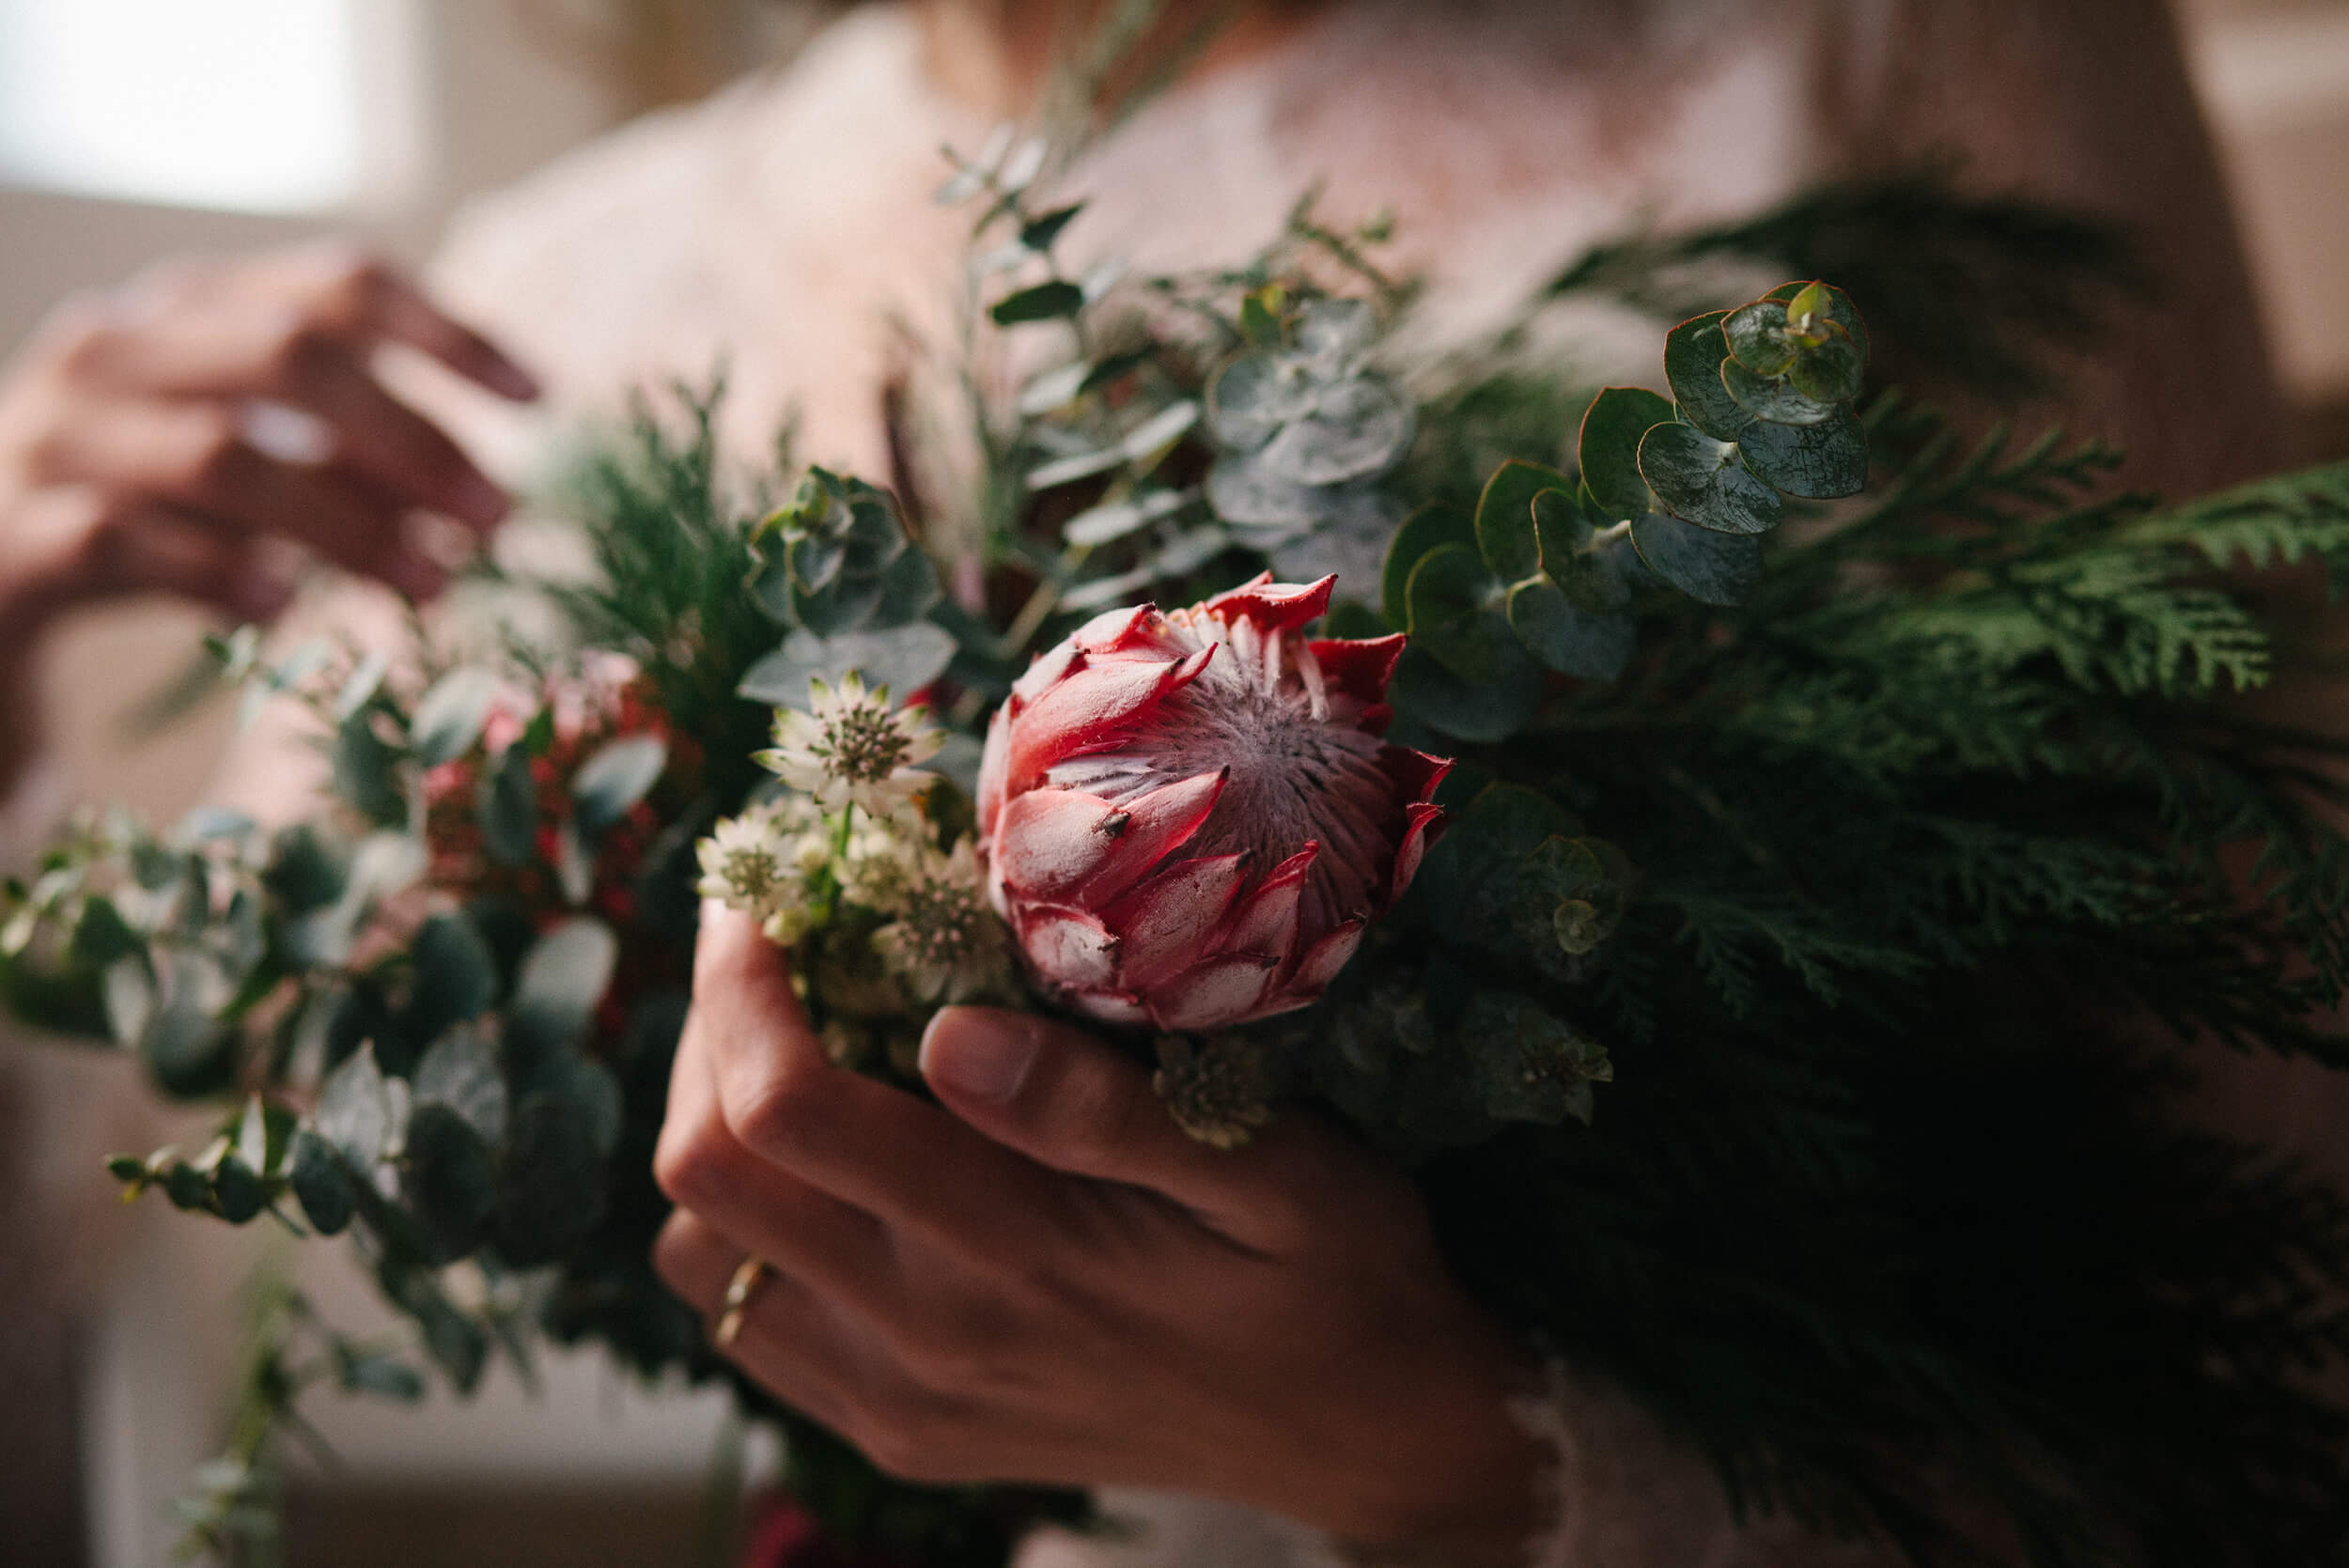 roma-organizacao-eventos-editorial-jardin-d'epoque-design-floral-12